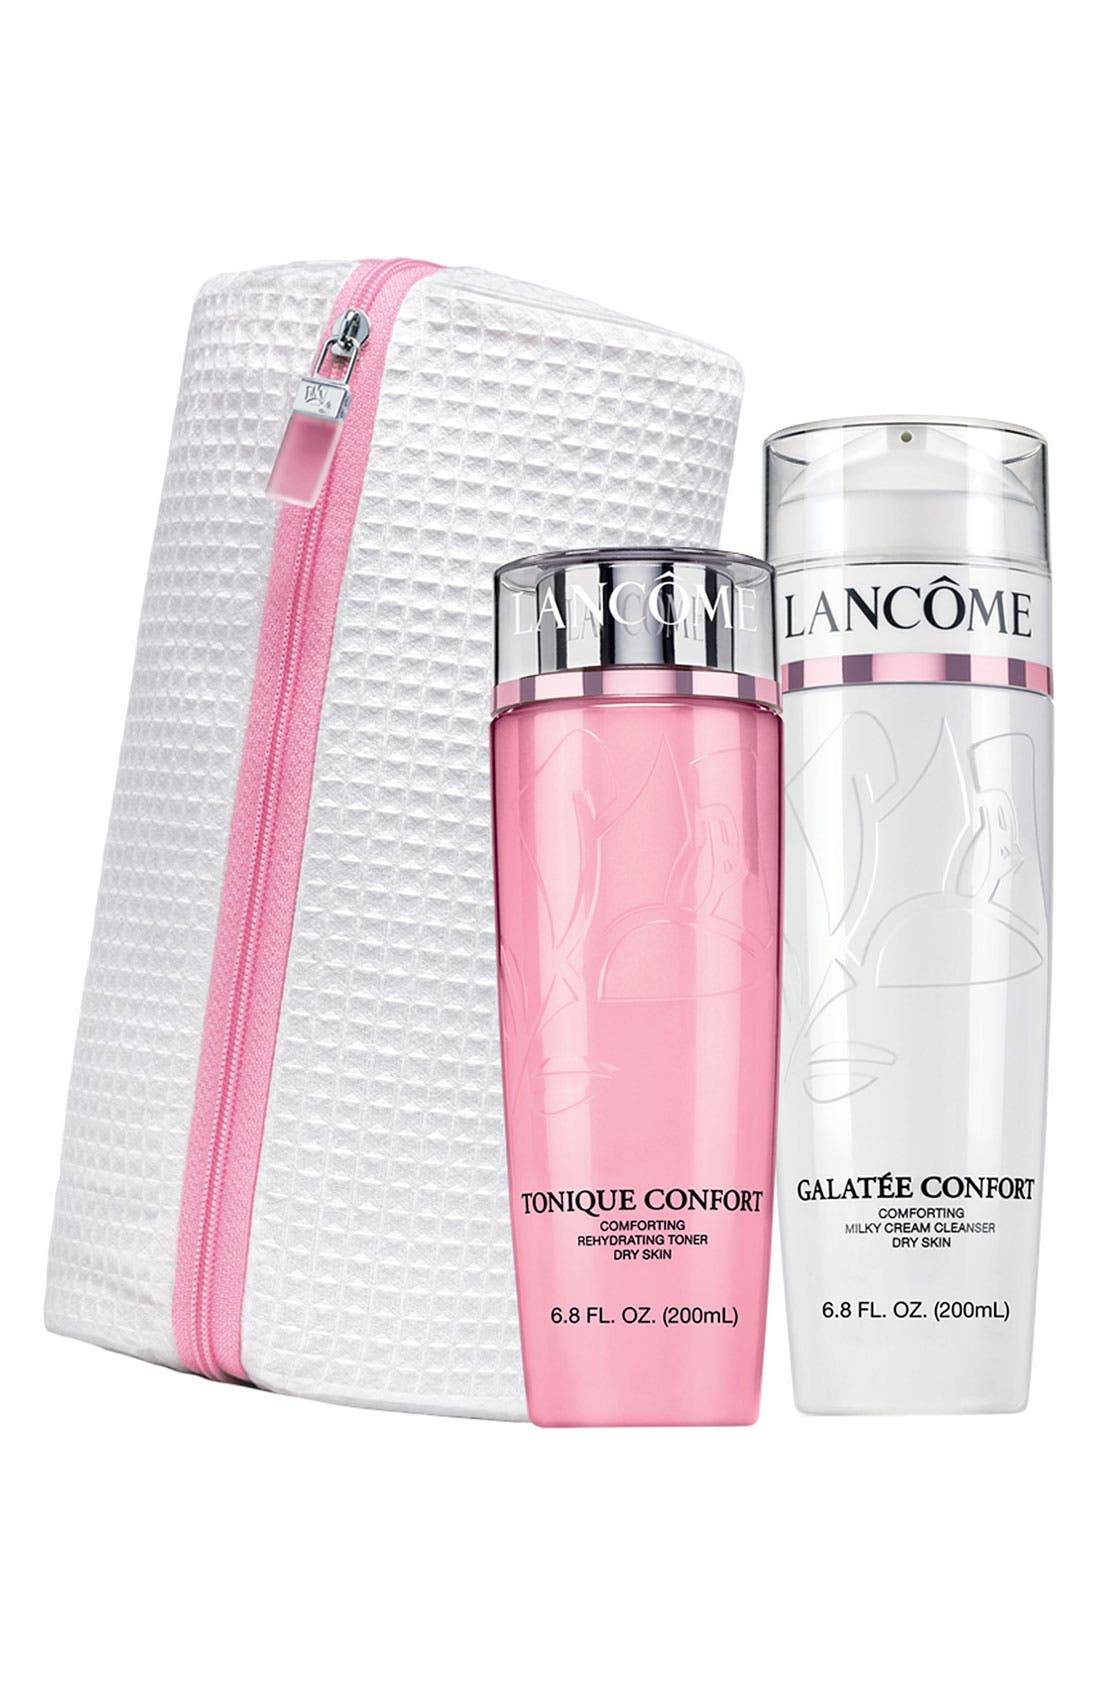 Alternate Image 1 Selected - Lancôme 'Confort' Toner & Cleanser Duo ($55 Value)